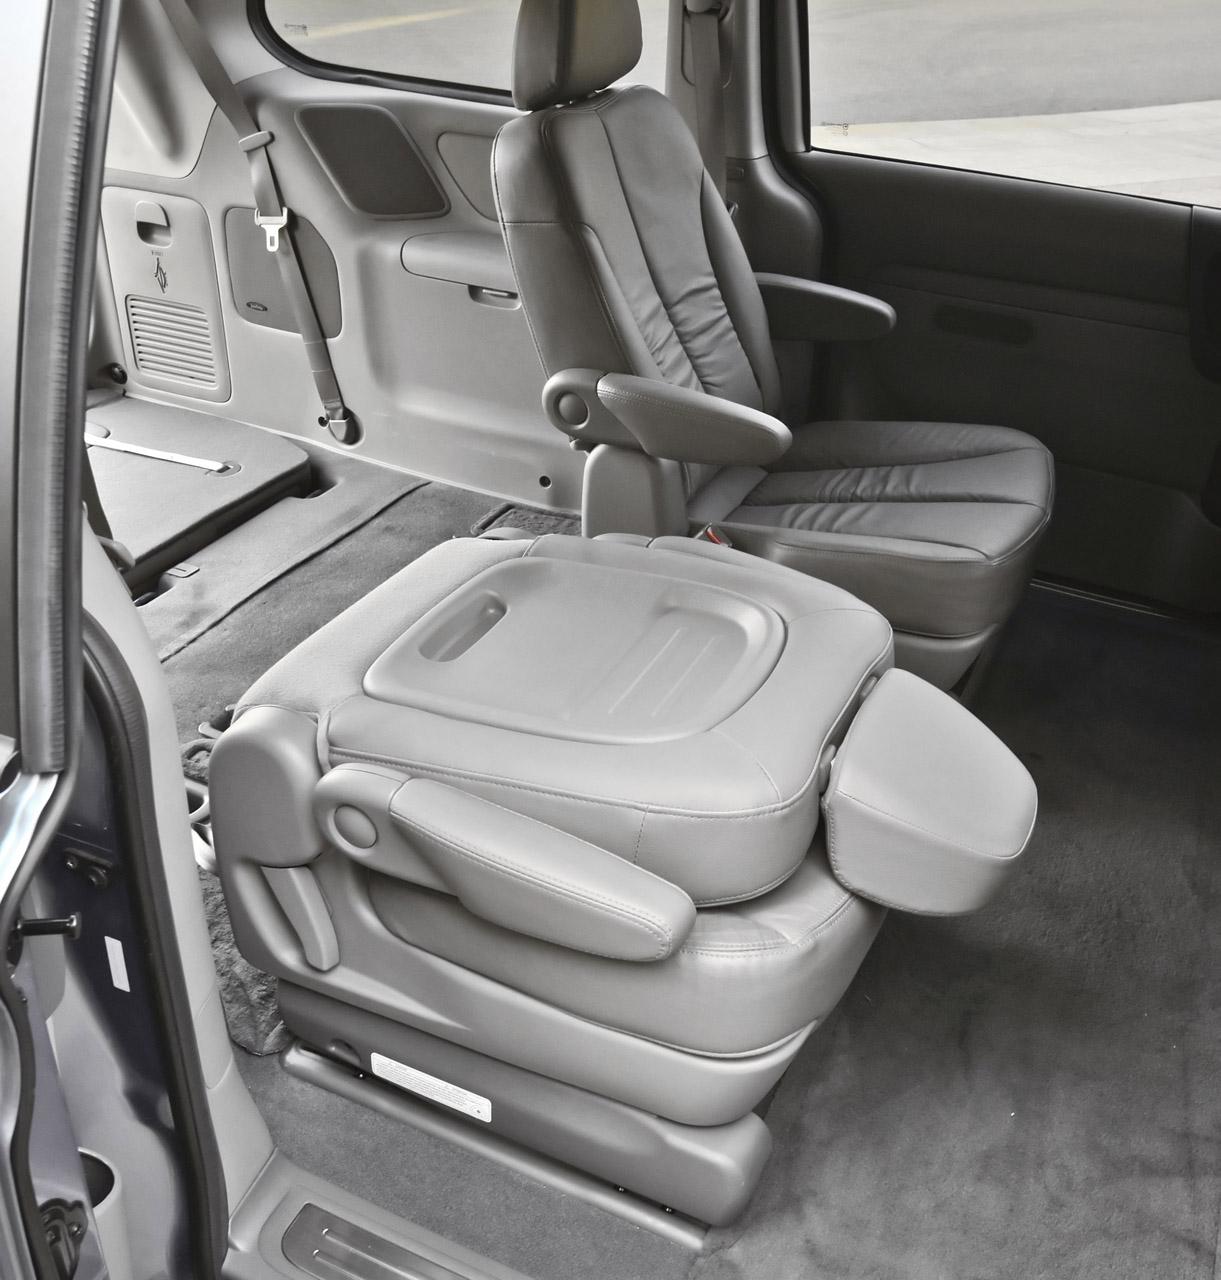 2007 Kia Sedona Interior: Kia Sedona Adopts New Engine, Corporate Grille For 2011